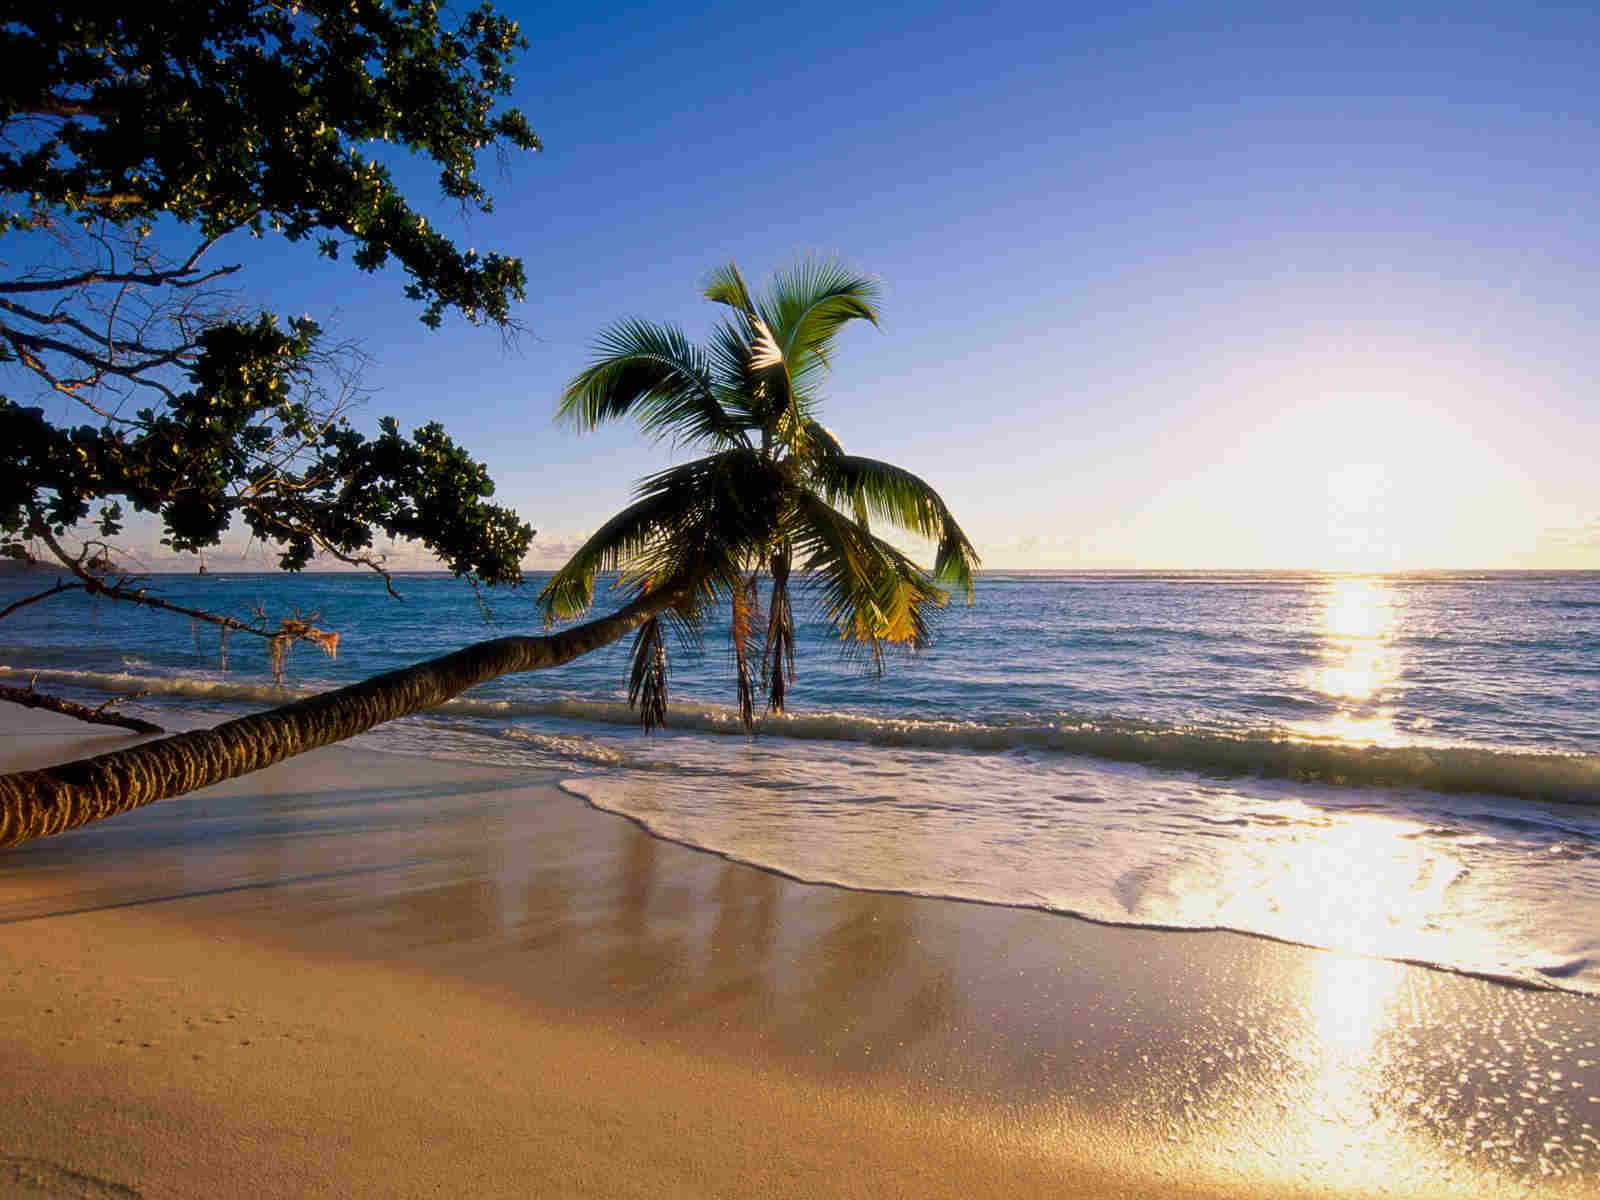 Sunrise Beach Wallpaper For You